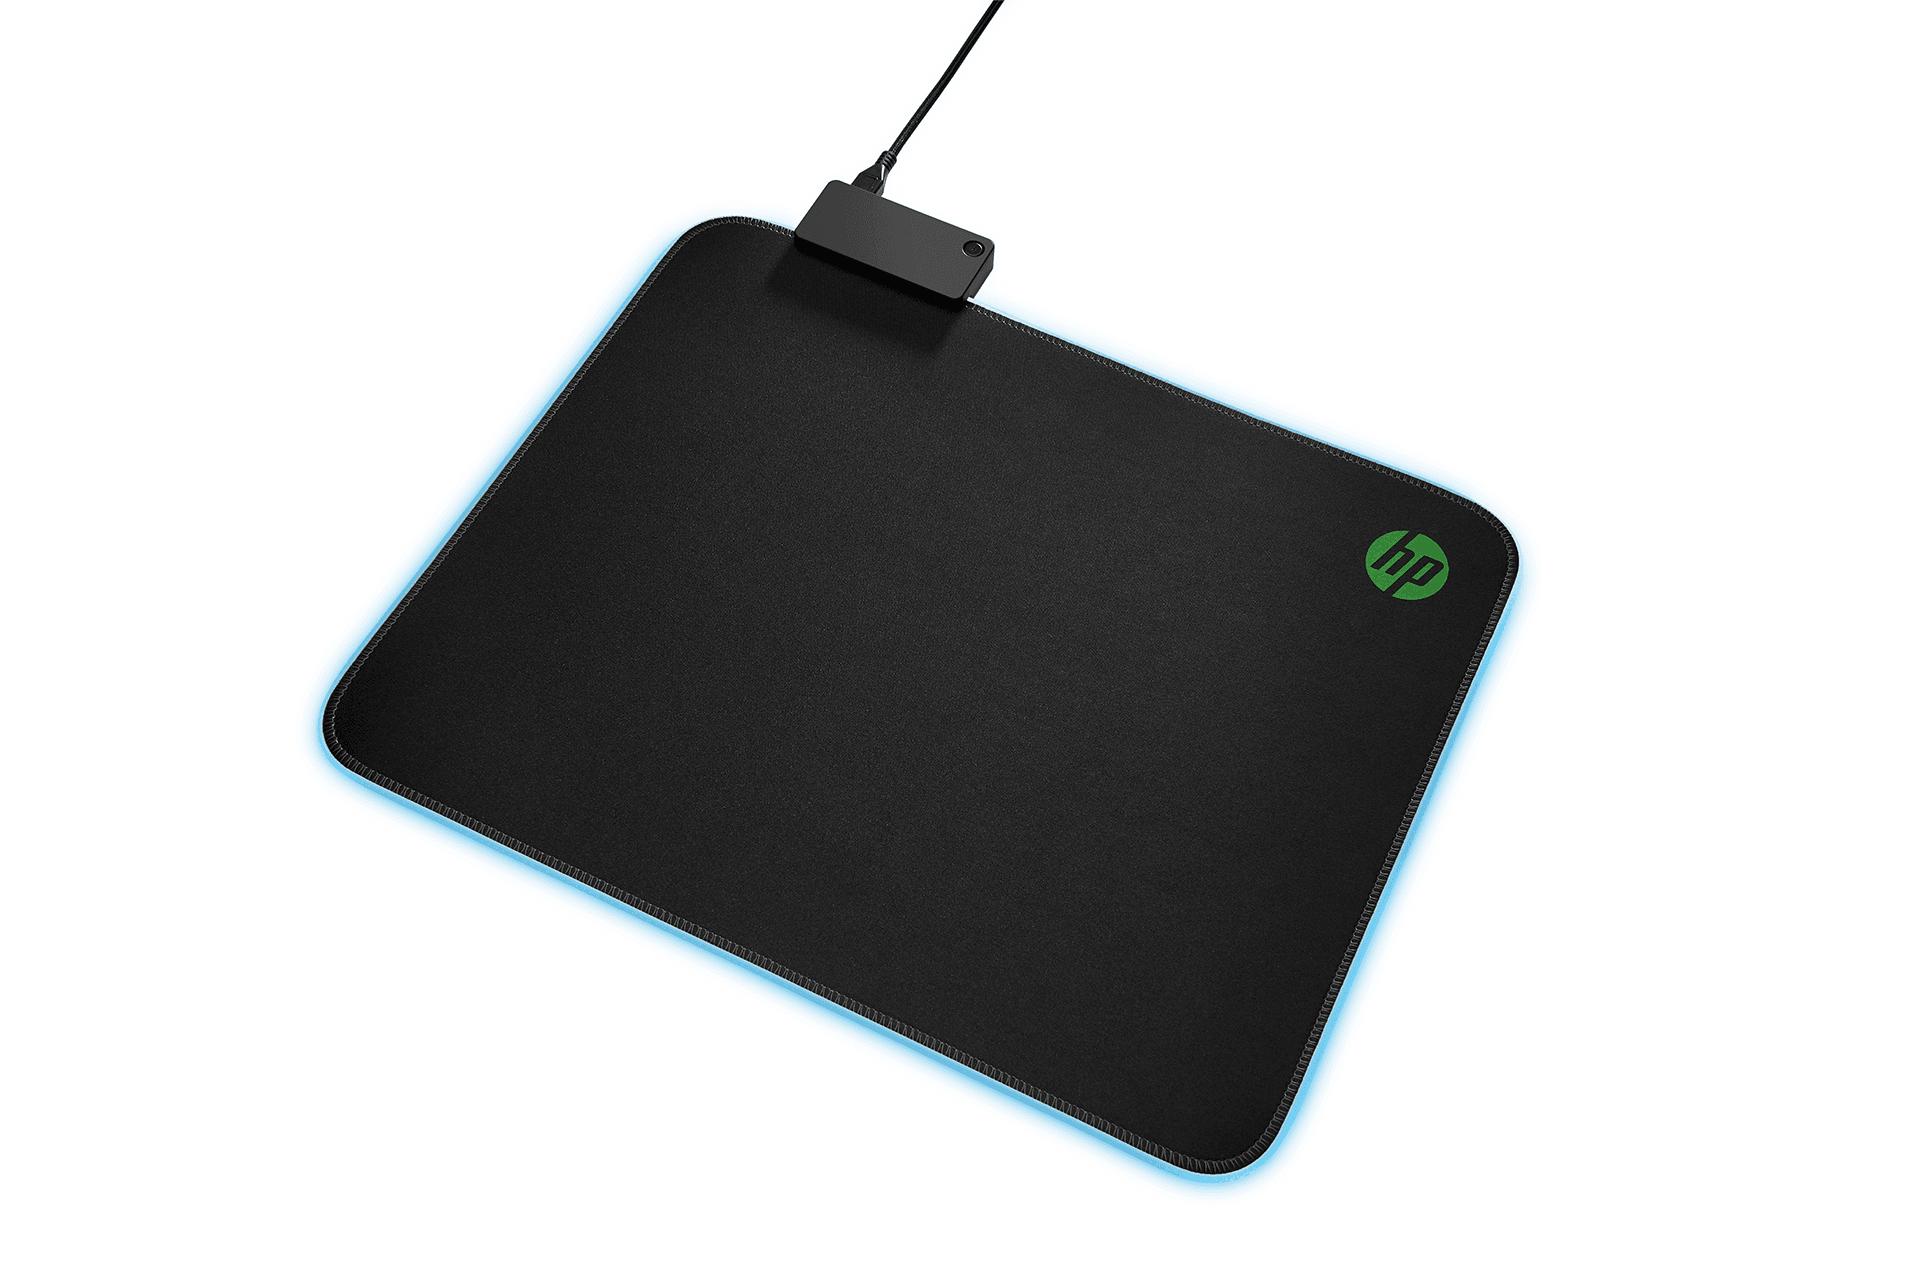 Hp Pavilion Gaming Mousepad 400 4 - Hynerd.it